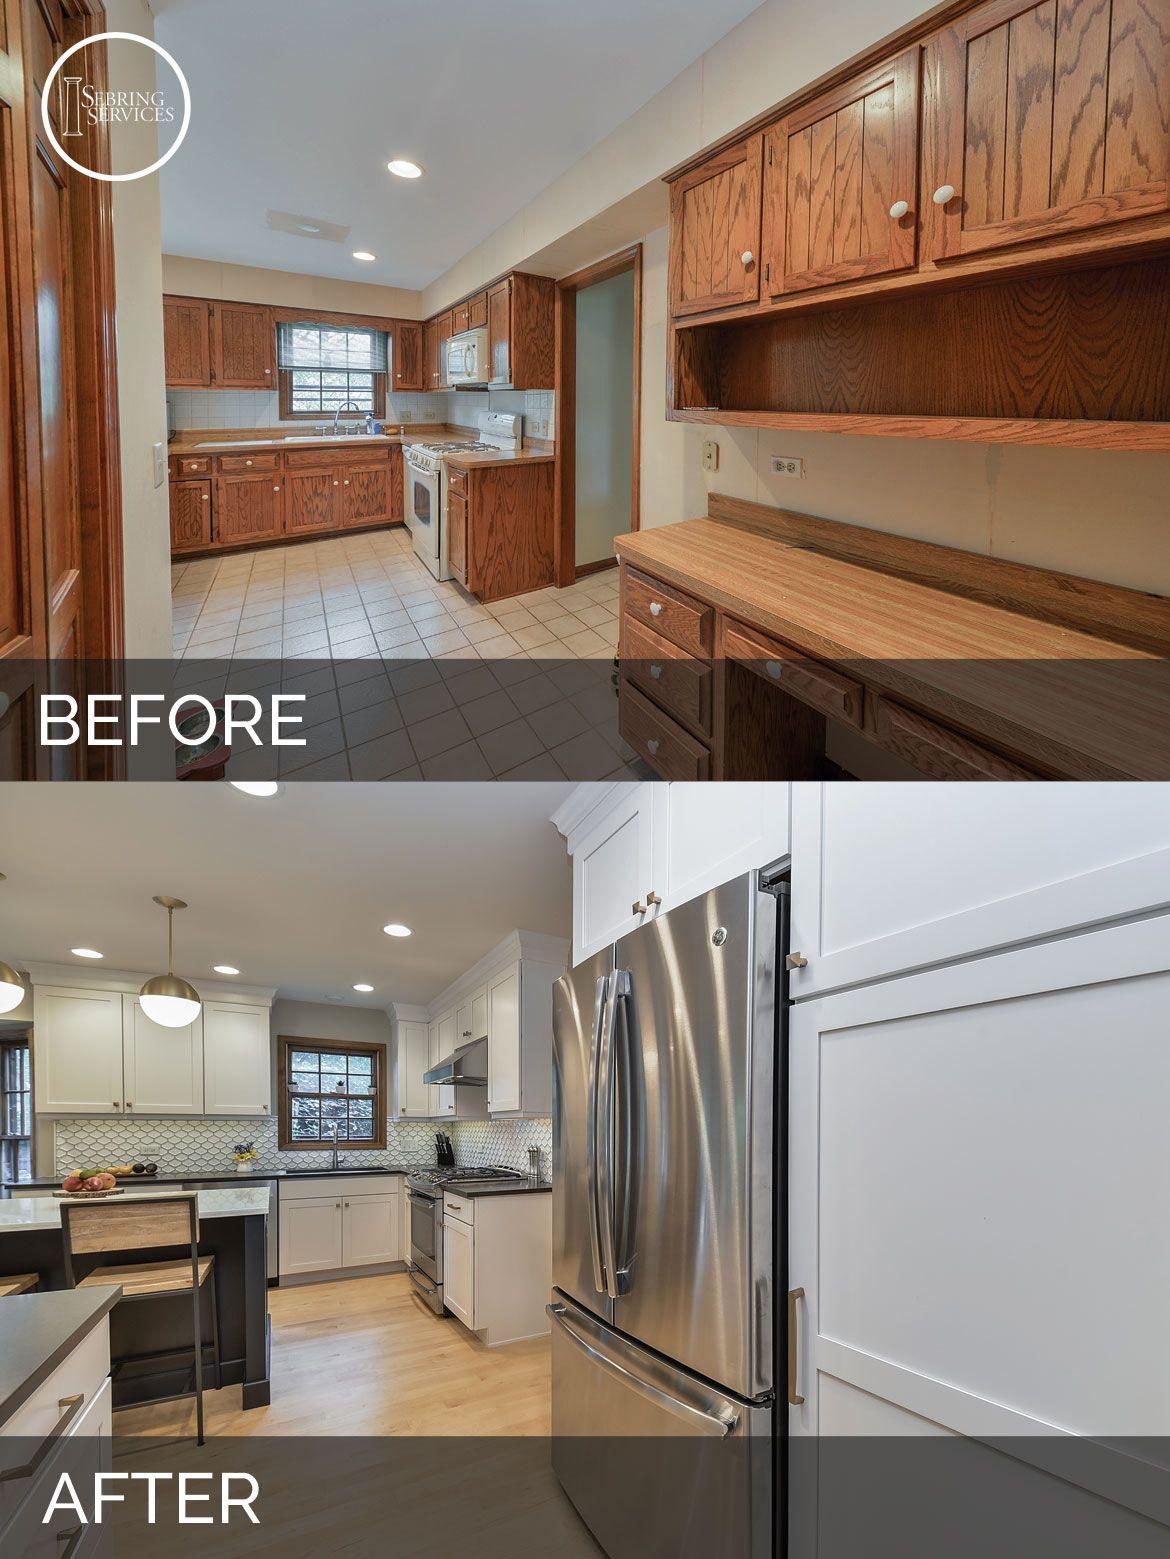 Justin & Carina's Kitchen Before & After Pictures  Remodeling Fascinating Bathroom Remodeling Naperville Design Inspiration